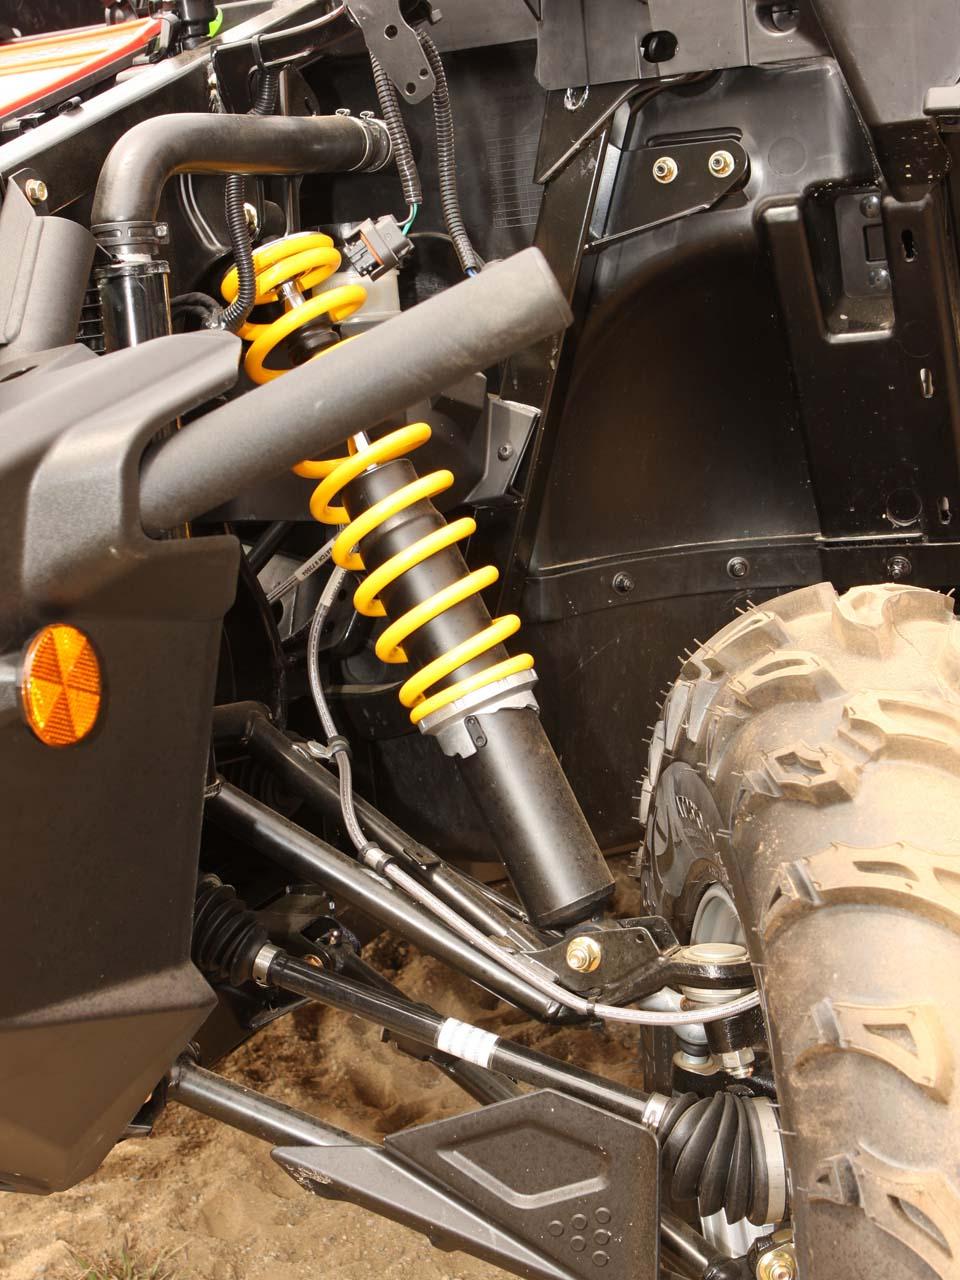 2011 can-am commander1000xt close-up front-suspension